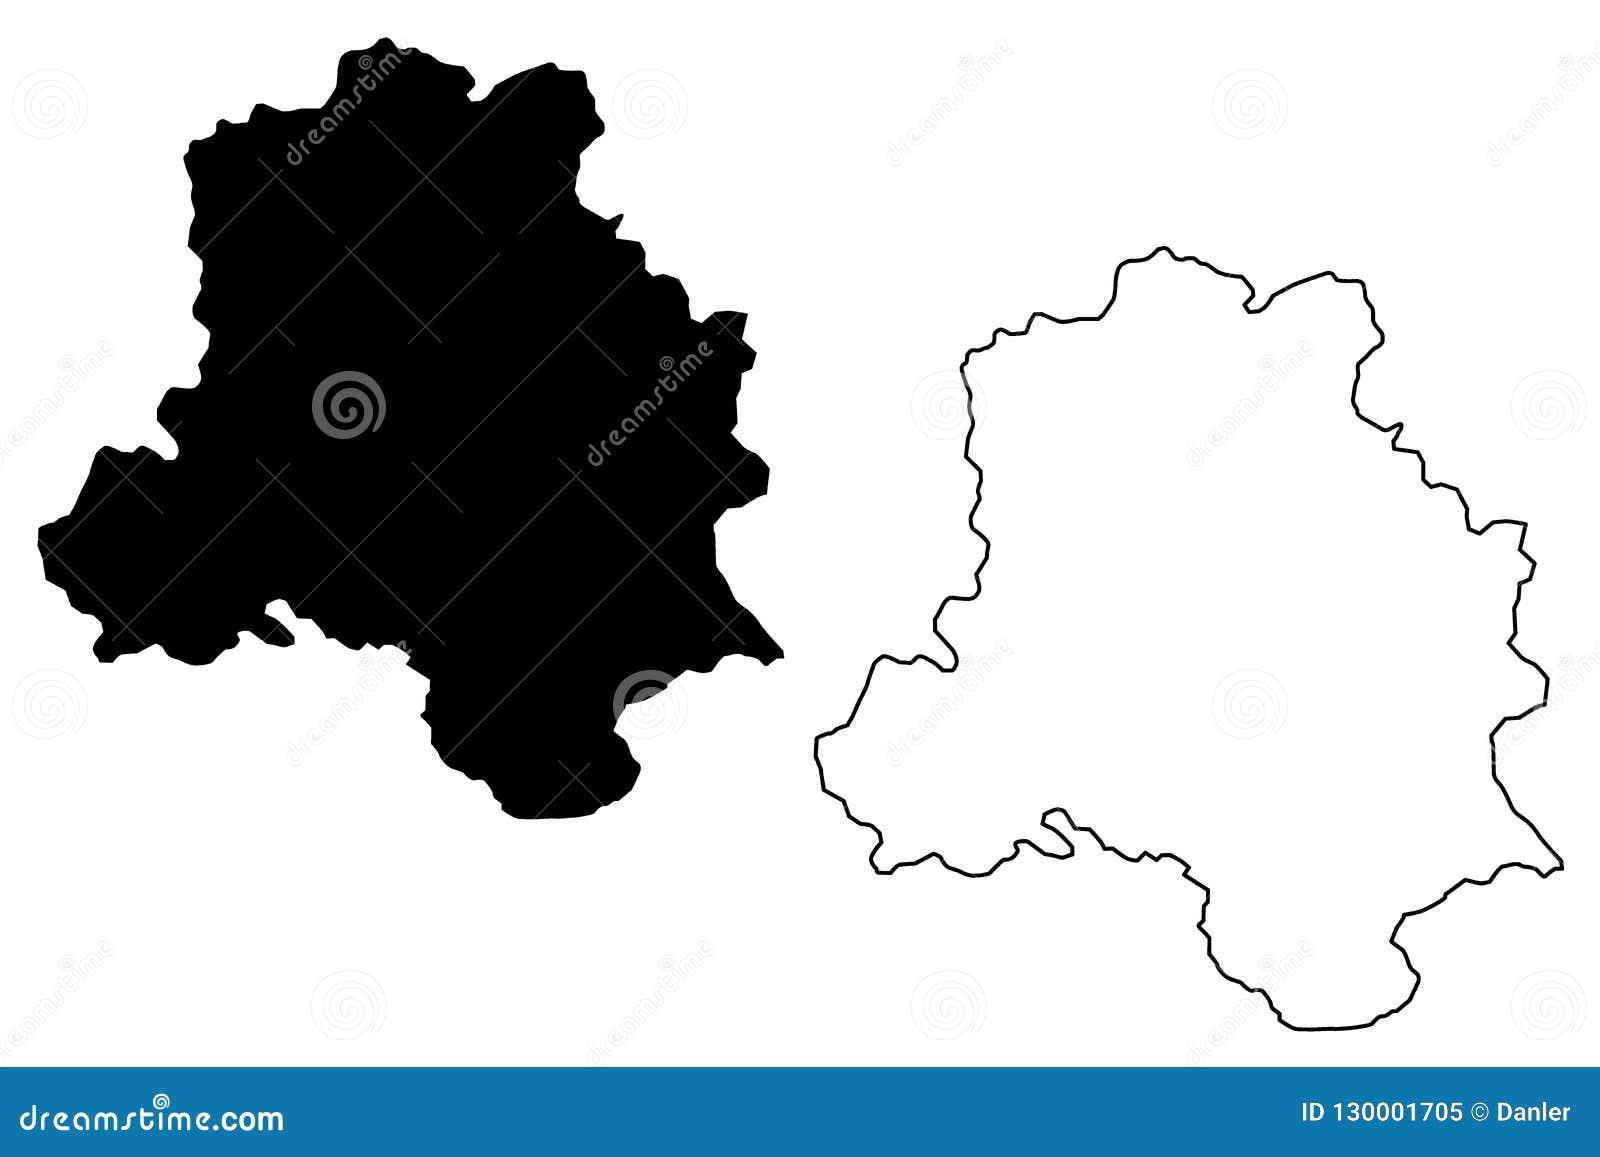 Delhi map vector stock vector. Illustration of icon - 130001705 on map of hardoi india, map of colombo india, map of kolhapur india, map of bihar state india, interactive map of india, map of kanpur india, map of guntur india, map of mumbai india, map of kollam india, map of pushkar india, map bangalore india, map of bay of bengal india, map of meghalaya india, map of varanasi india, map of pune india, map of istanbul turkey, map of rajkot india, map of gorakhpur india, map of princely states india, map of san pedro sula honduras,